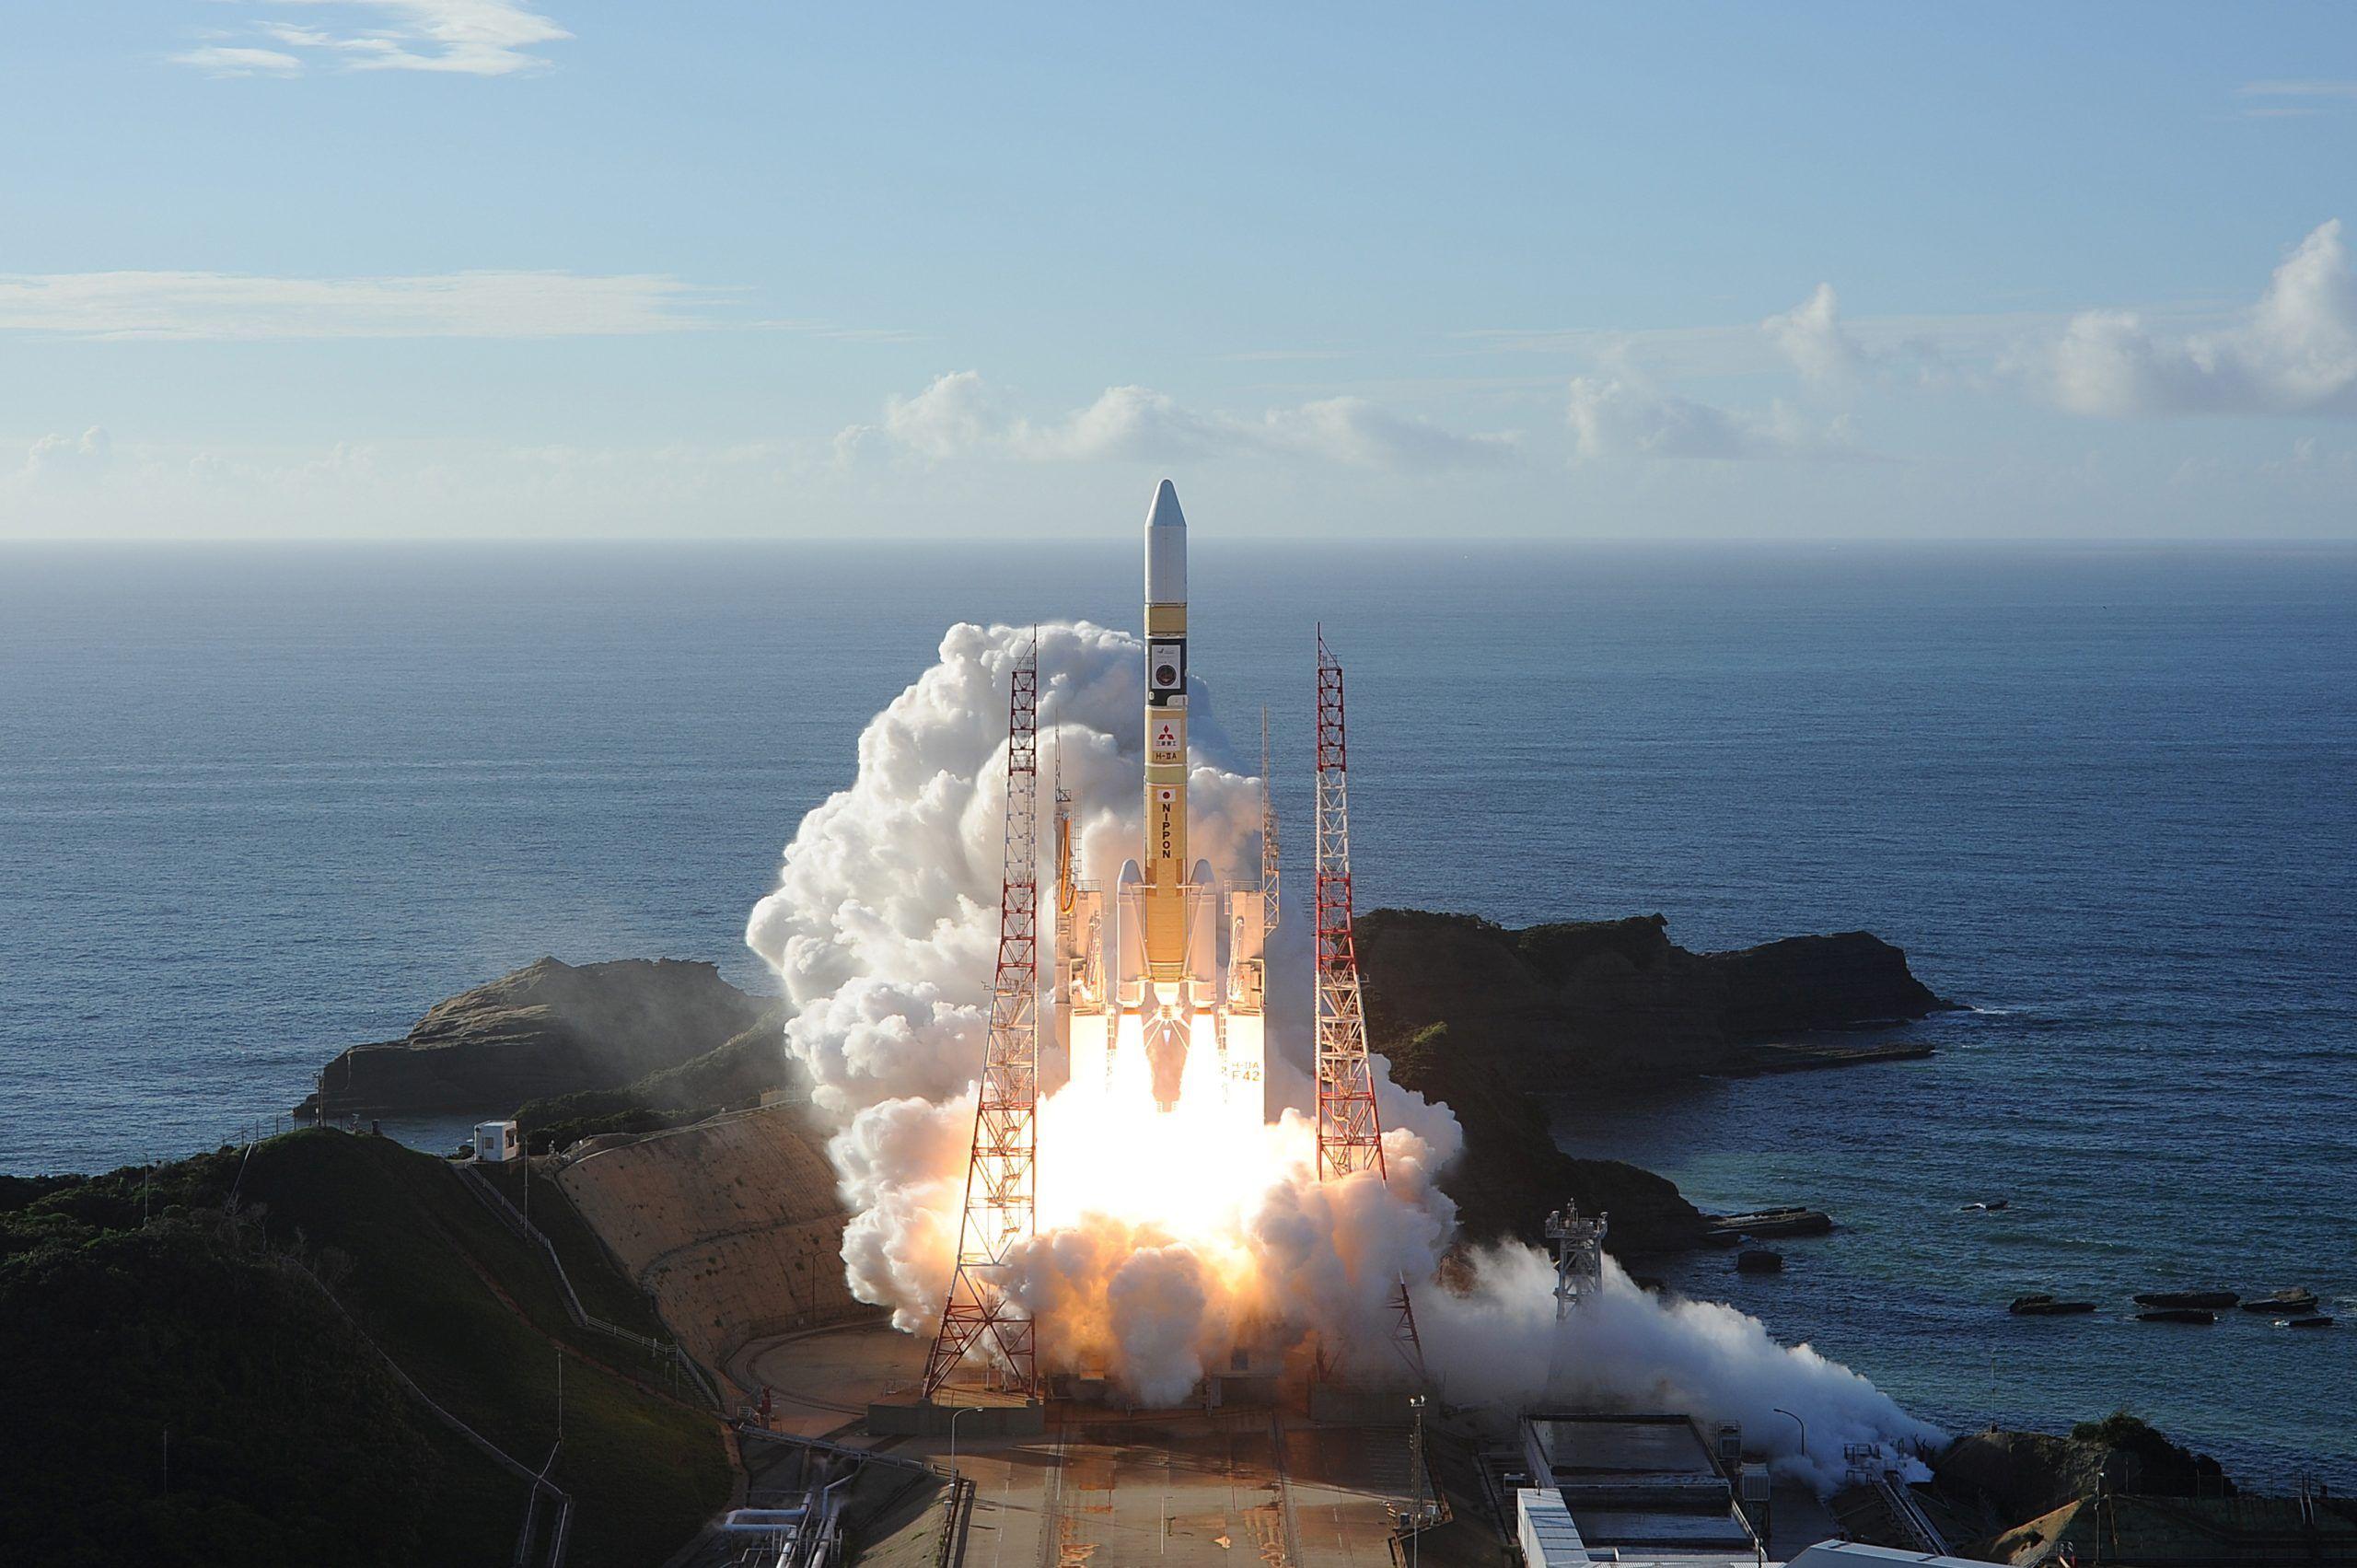 2020-07-20T040431Z_1_LYNXNPEG6J056_RTROPTP_4_SPACE-EXPLORATION-EMIRATES-JAPAN-scaled